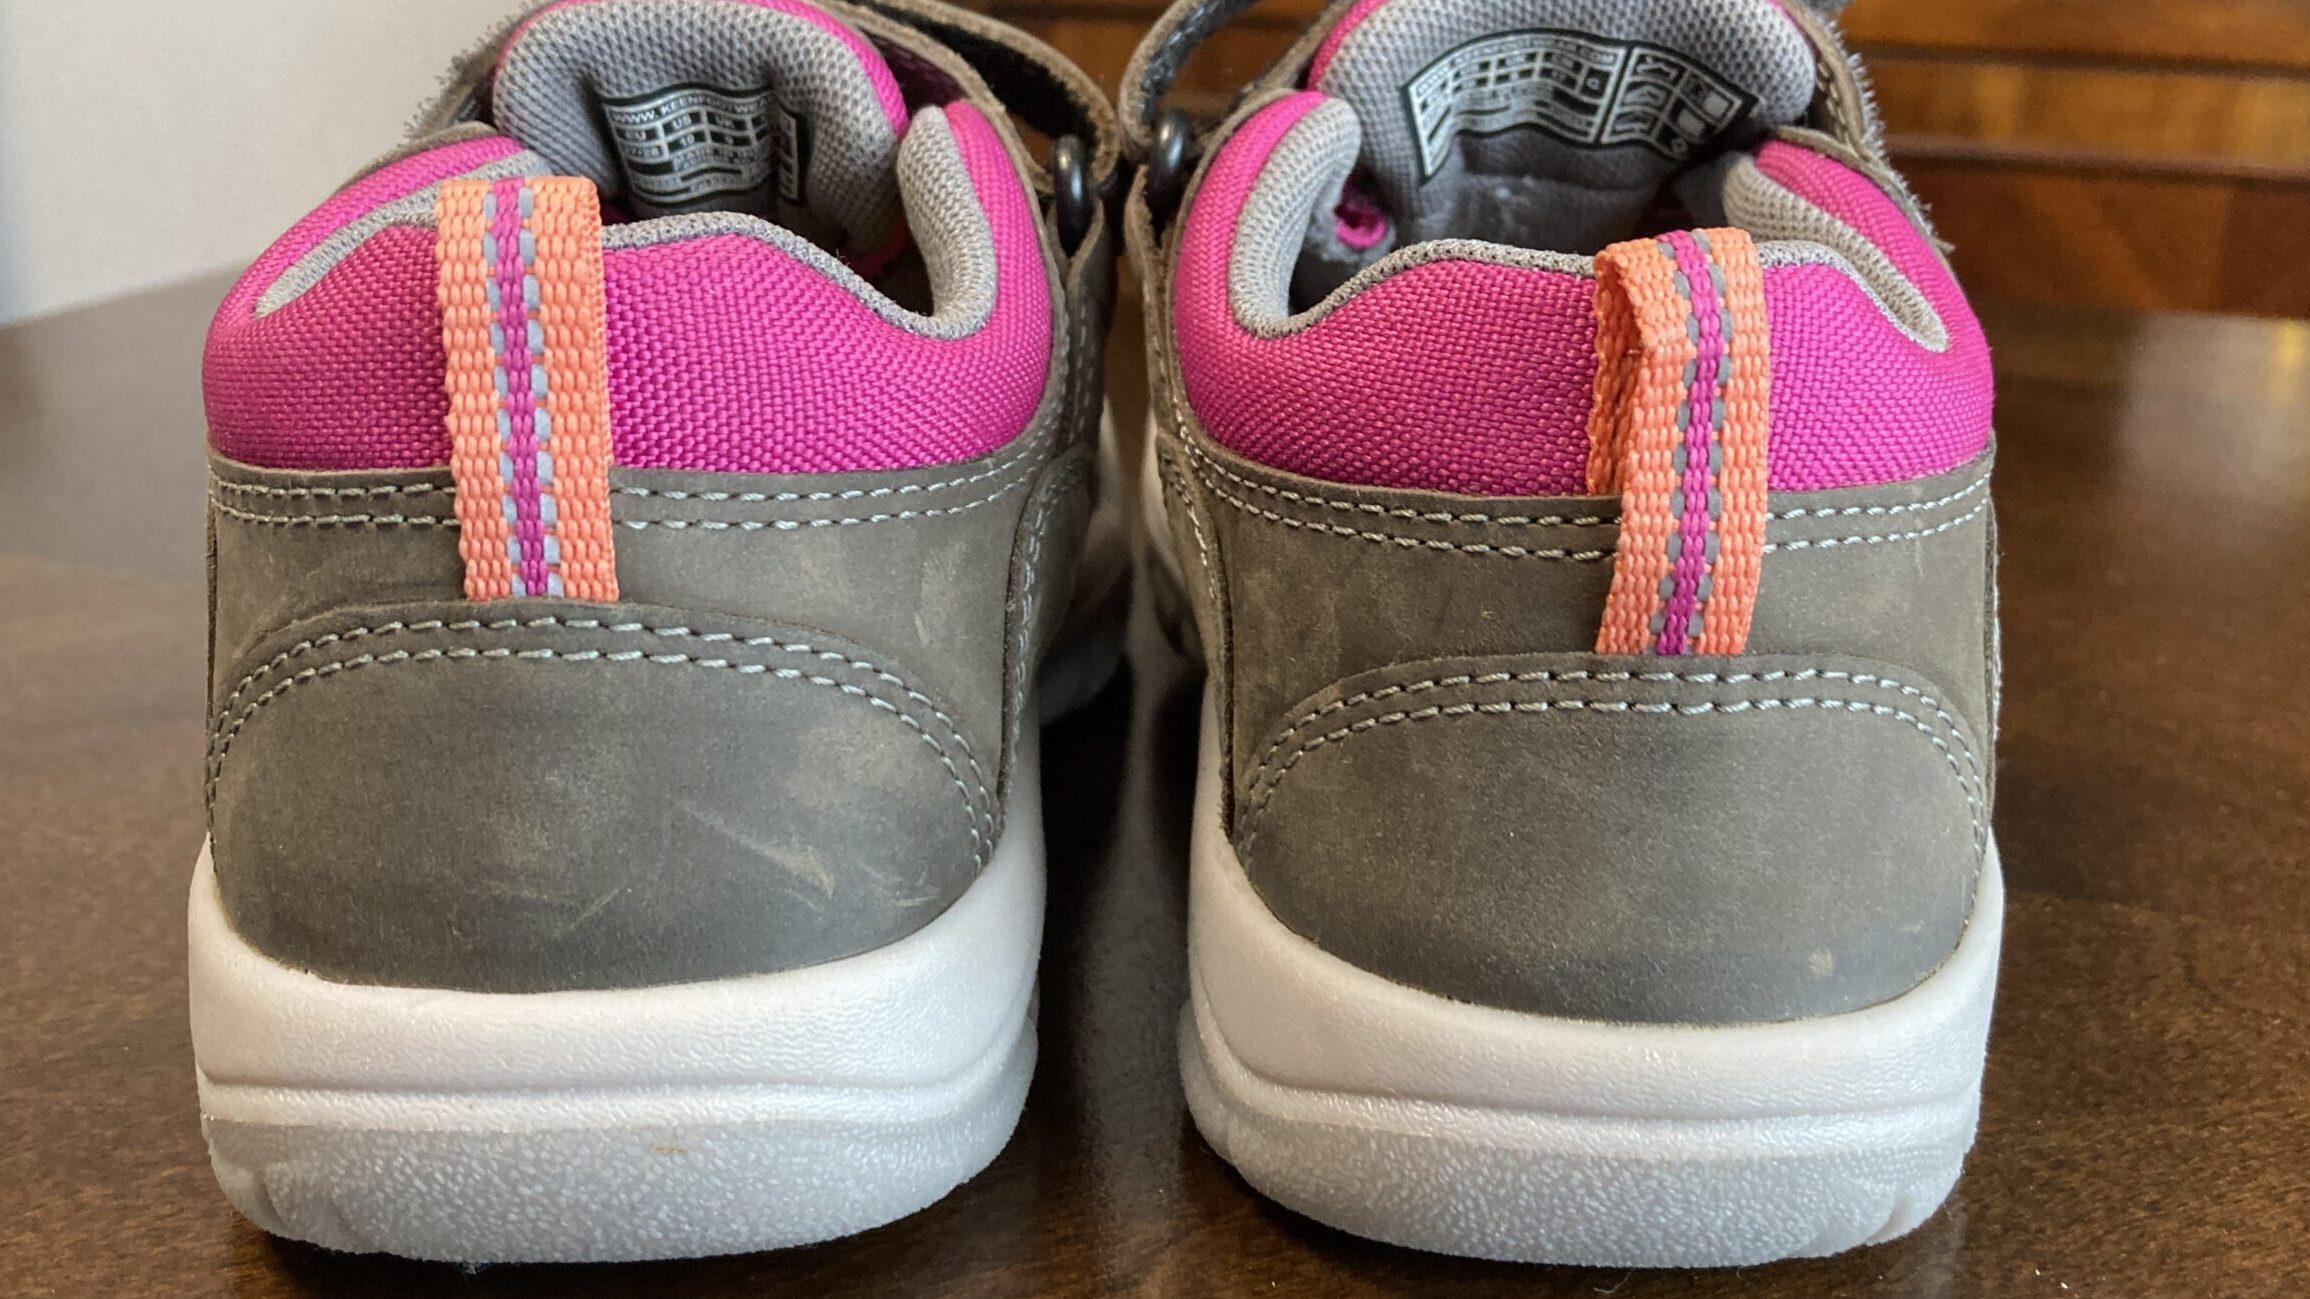 KEEN(キーン)のキッズの靴(スニーカー)ってどう?サイズ感は?防水は?など徹底調査!【ニューポートシューズのレビュー記事】のイメージ画像12